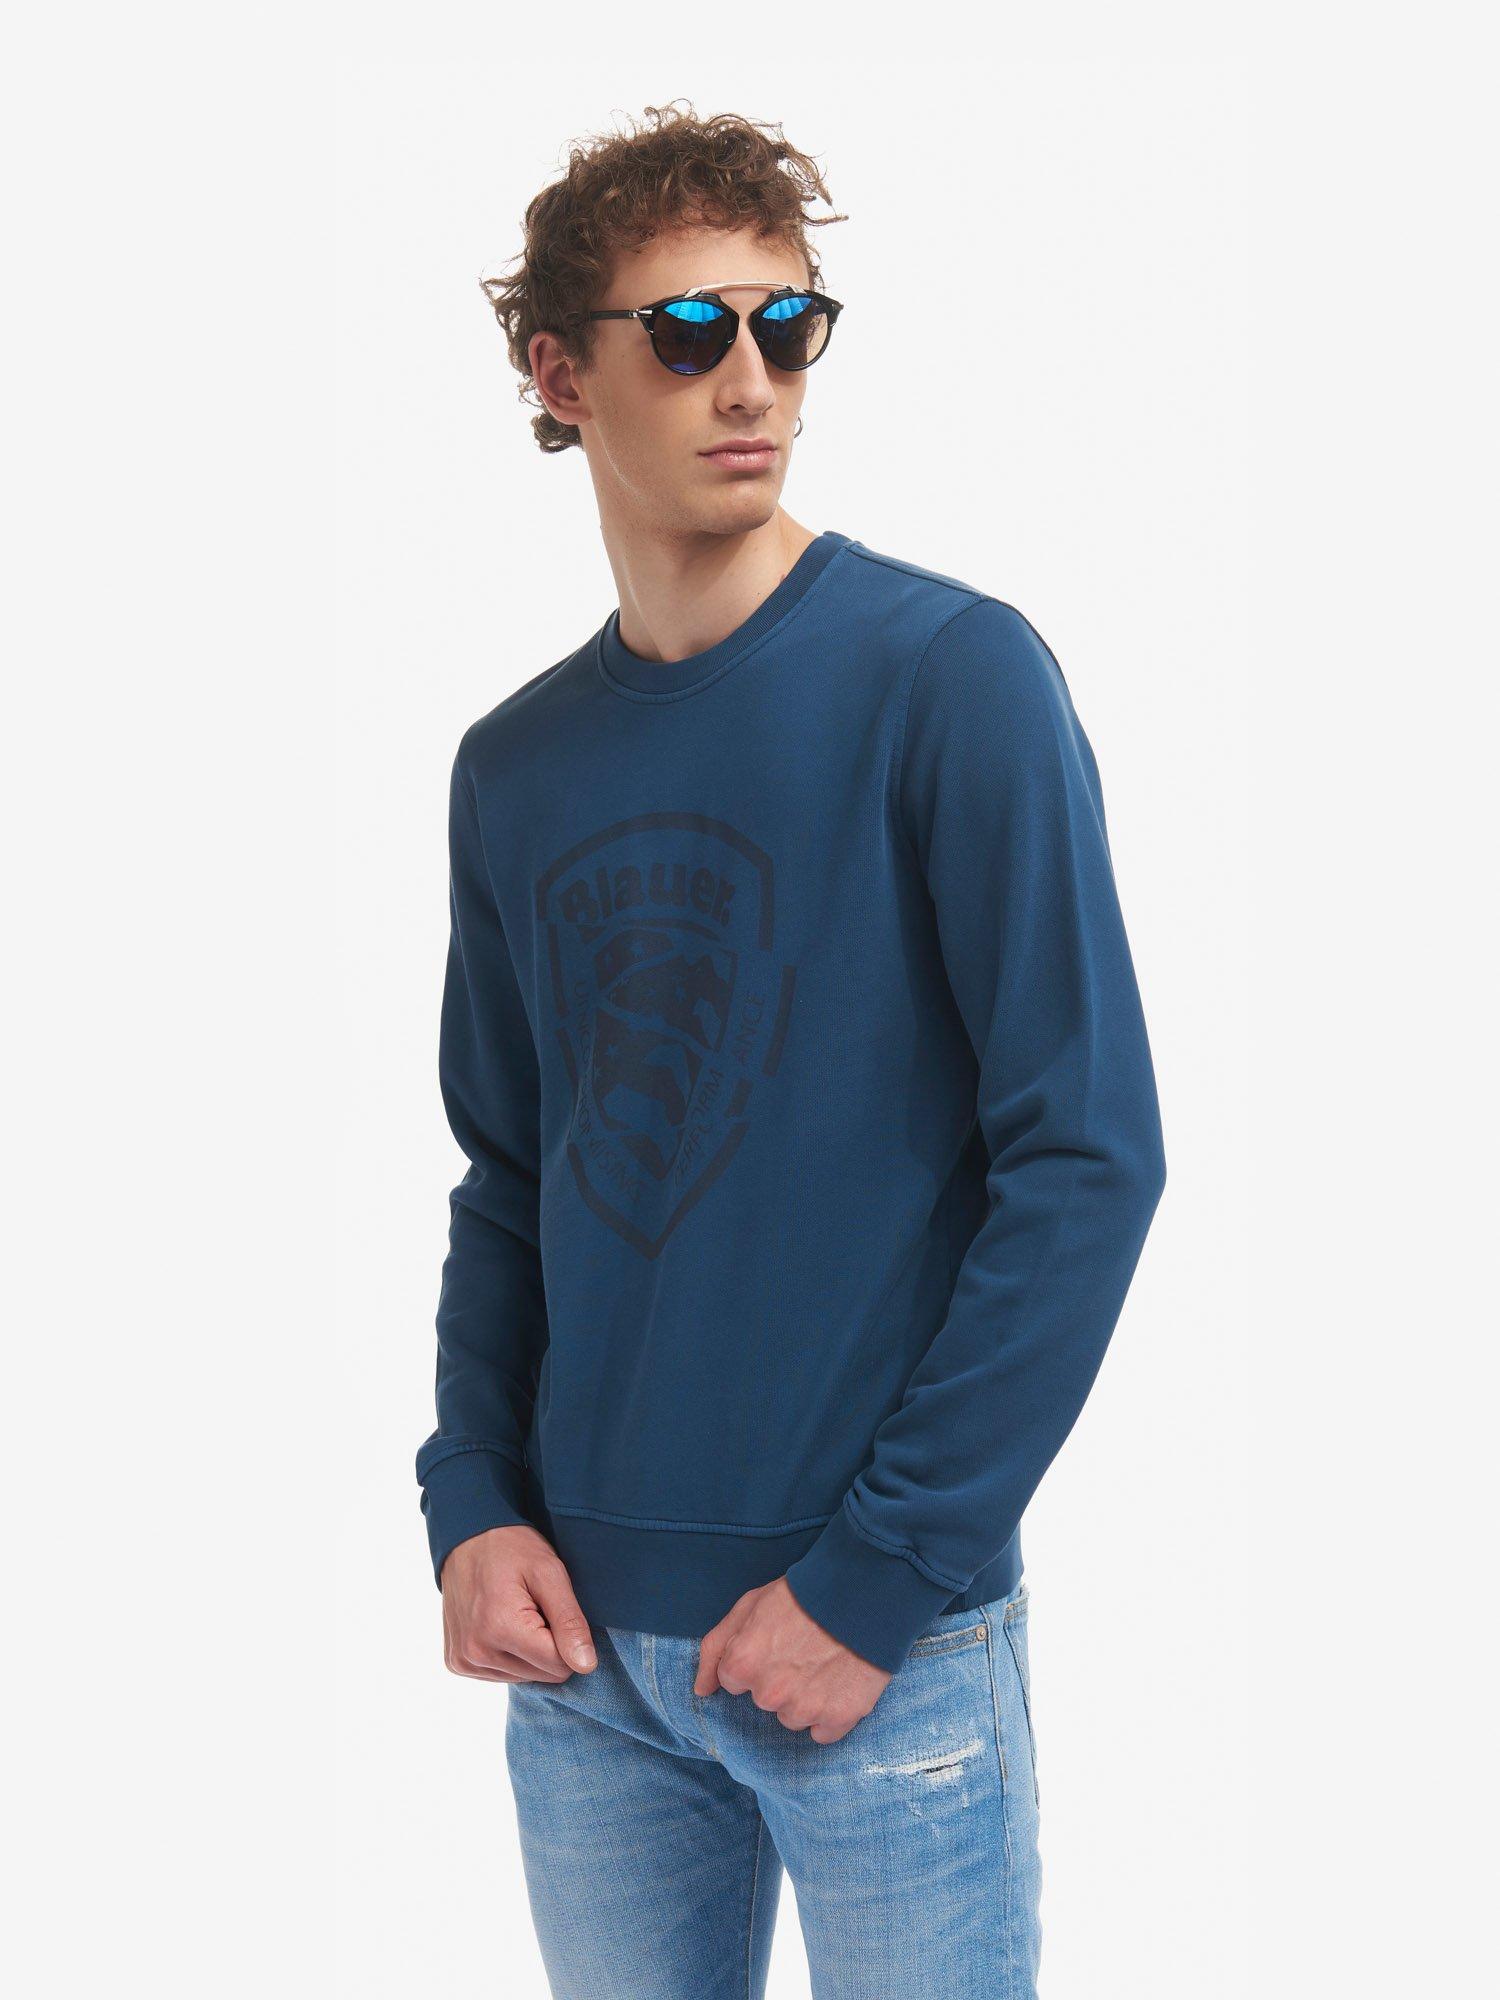 Blauer - FELPA BLAUER GIROCOLLO IN COTONE - Zaffiro Scuro - Blauer